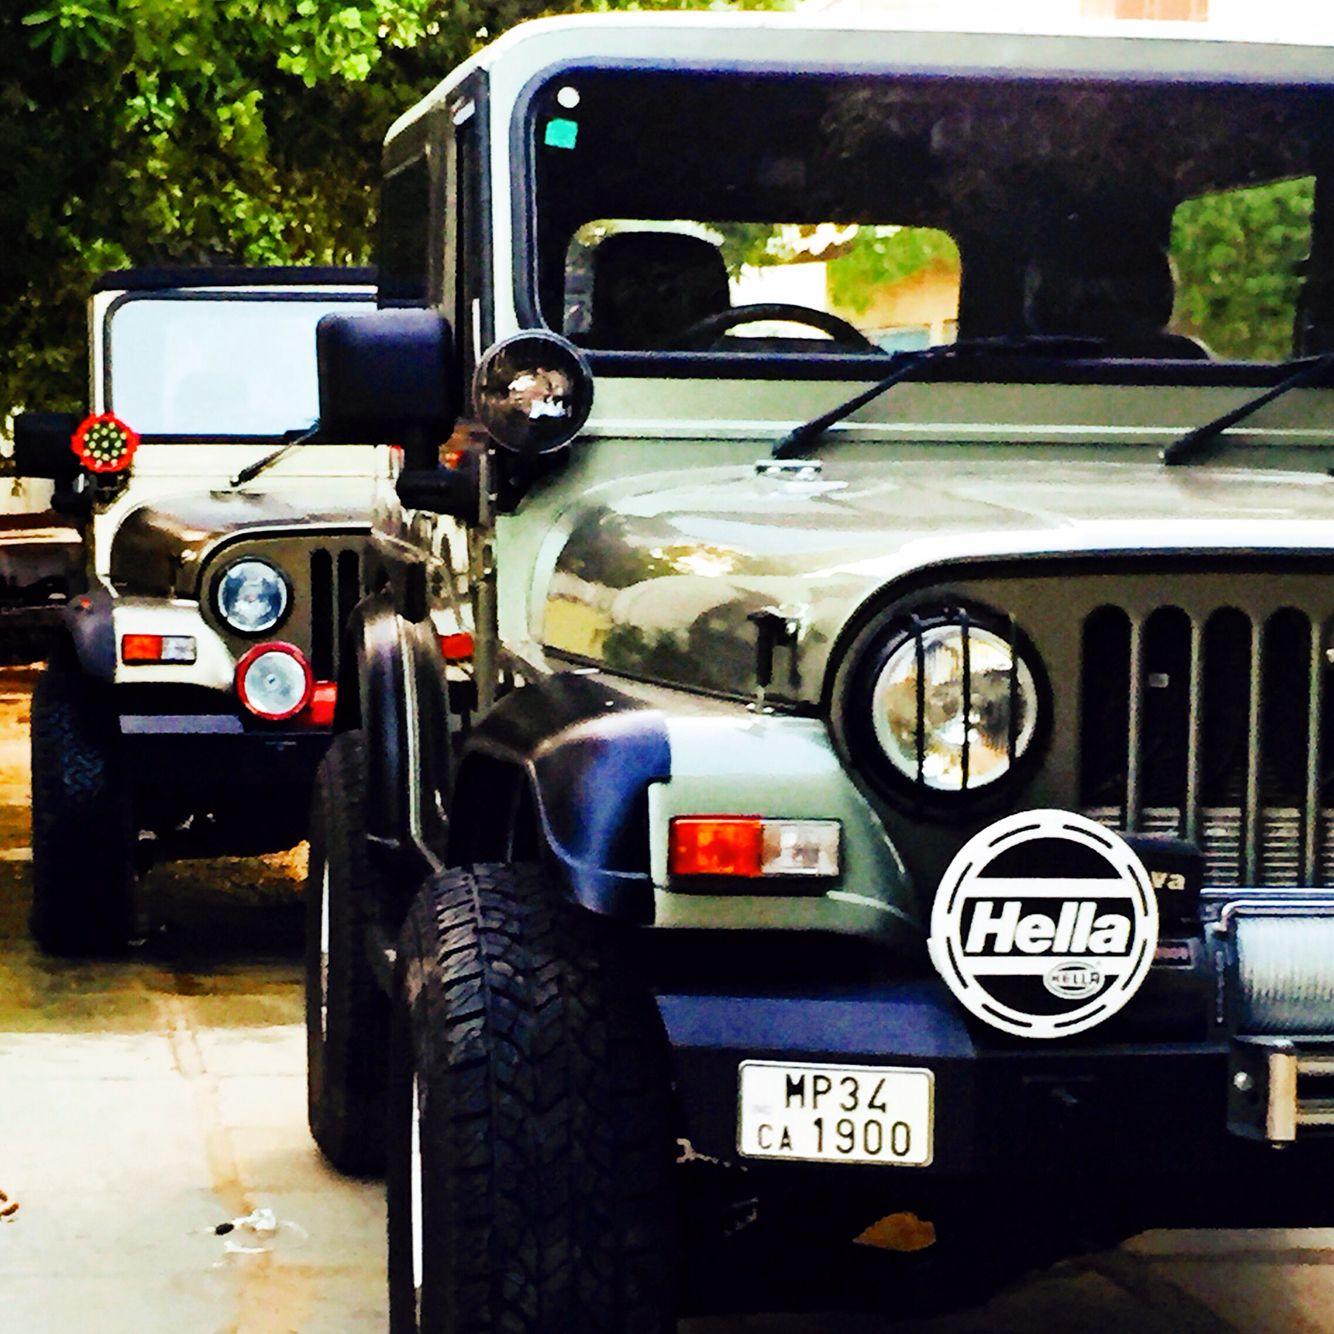 Rajputana Jeeps Custom Thar Mahindra Thar Jeep Jeep Willys